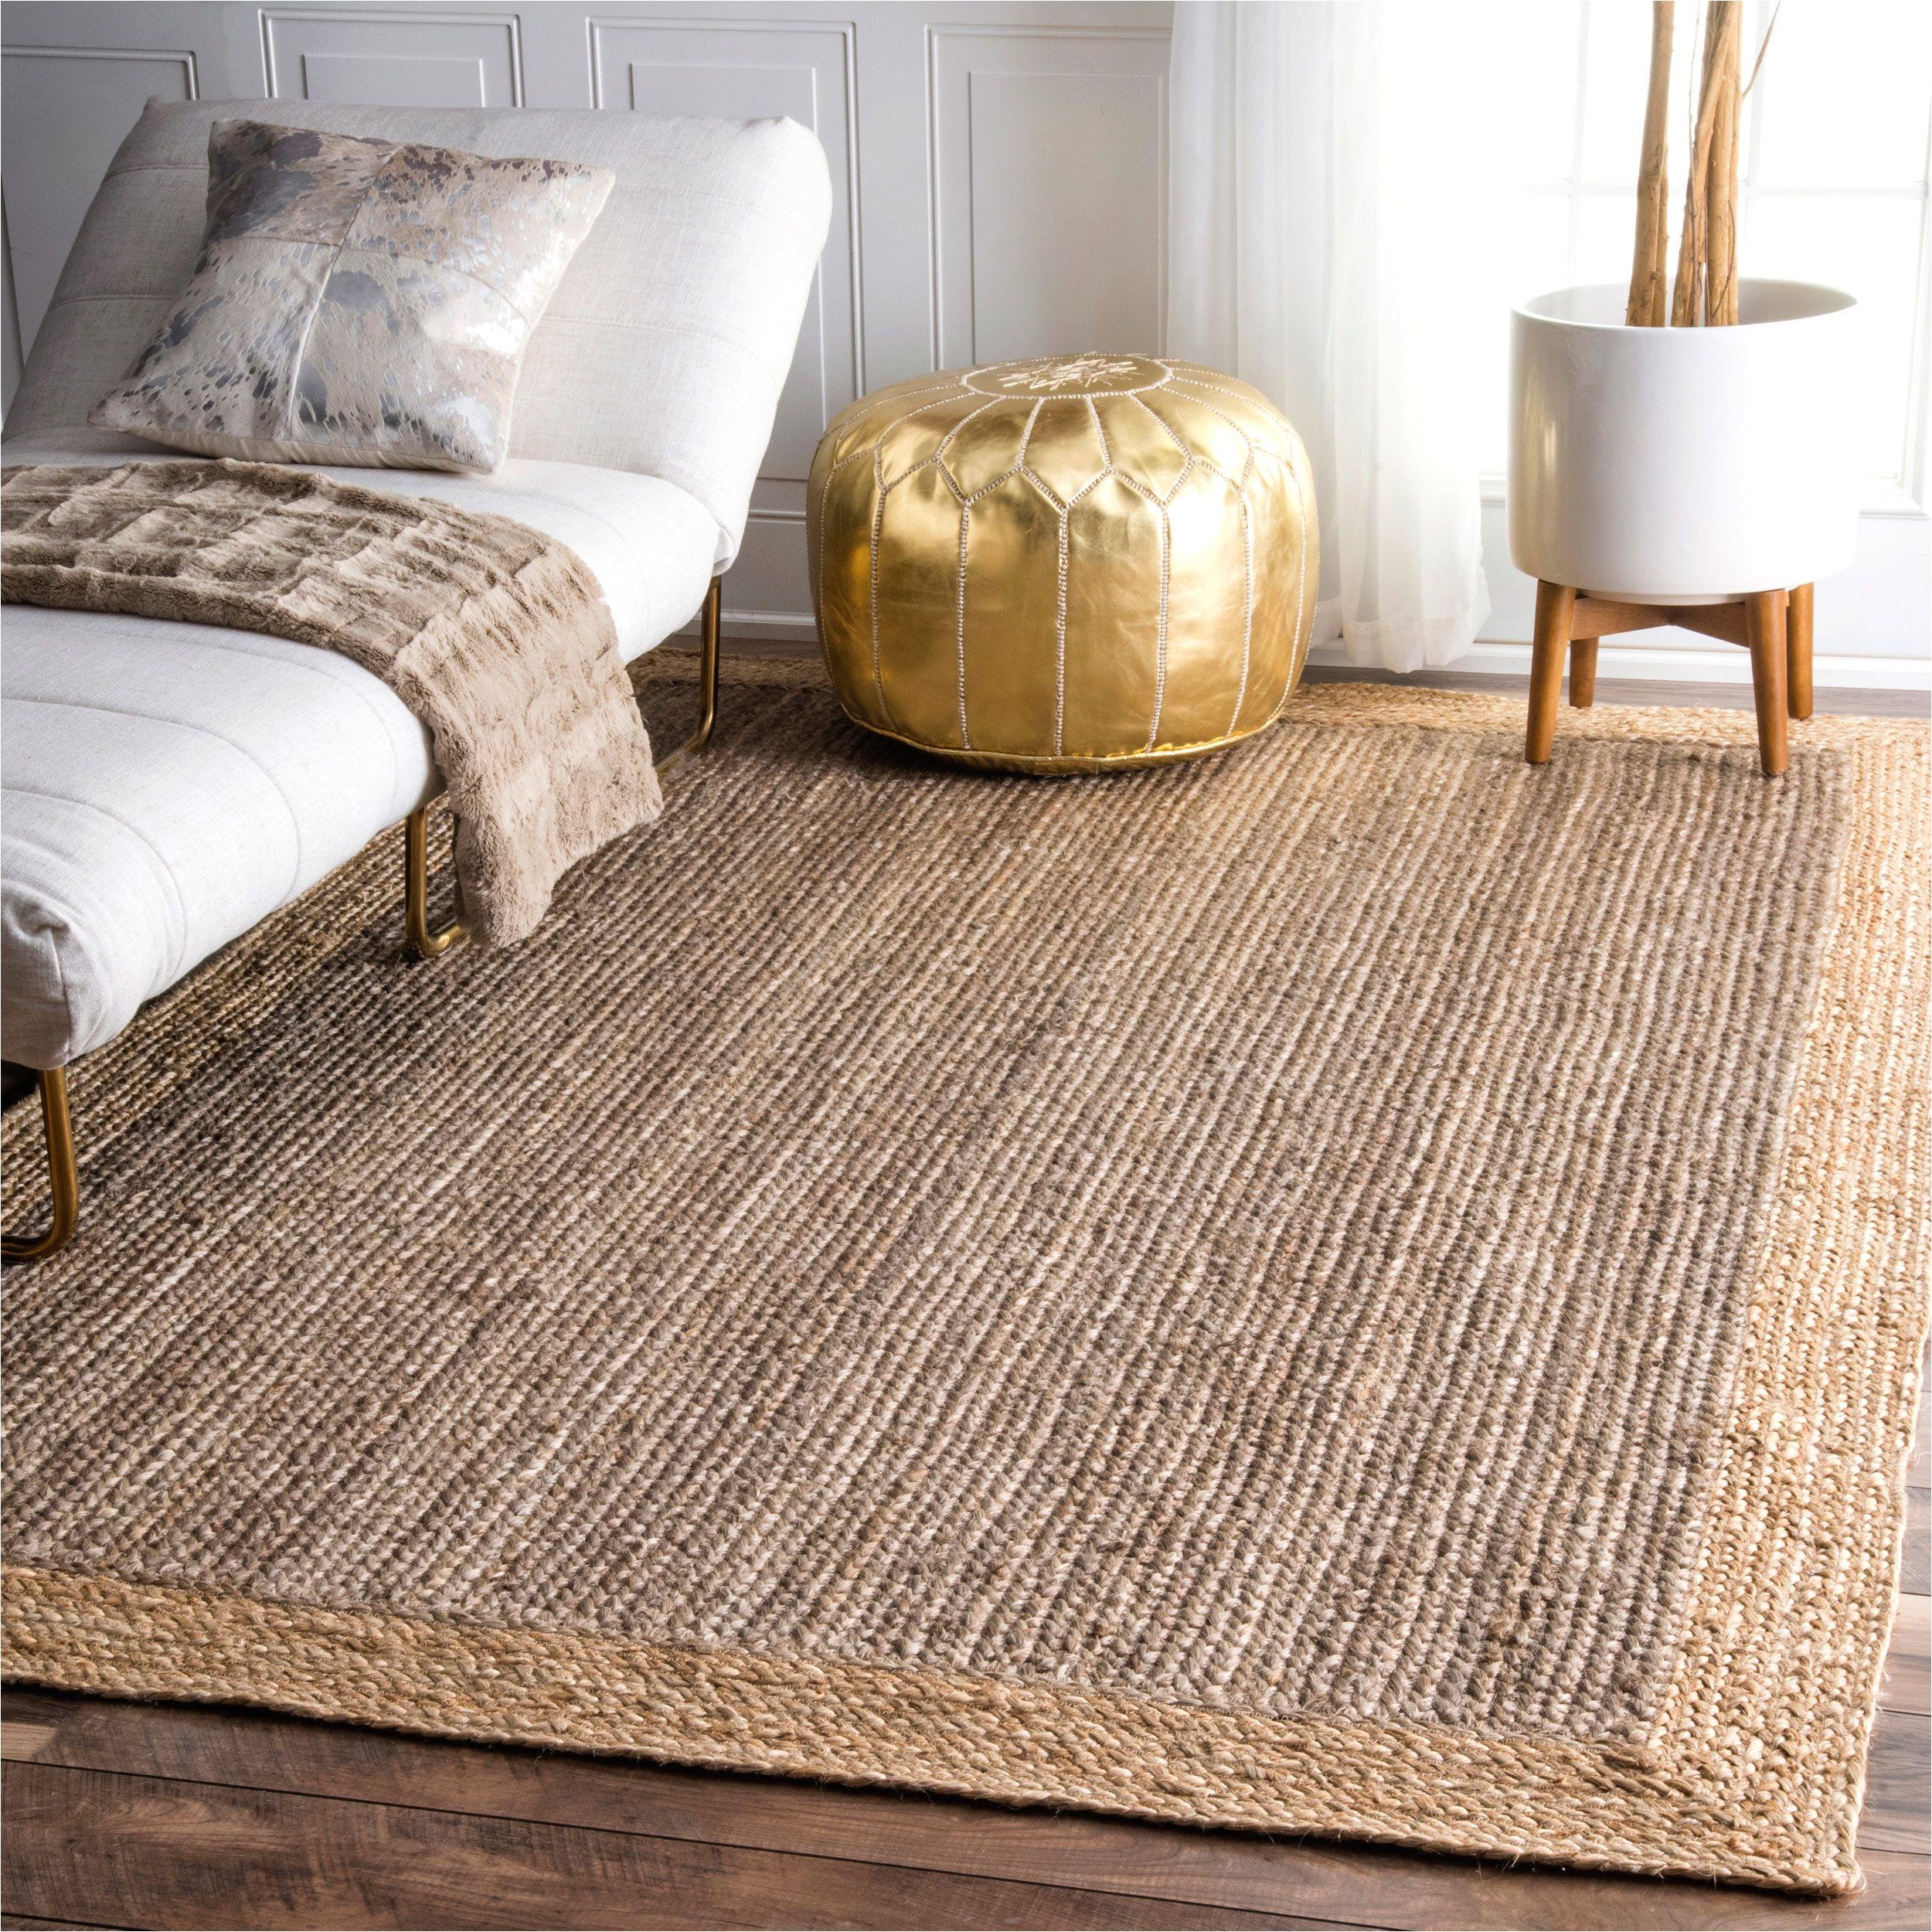 nuloom alexa eco natural fiber braided reversible border jute grey rug 5 x 8 grey beige size 5 x 8